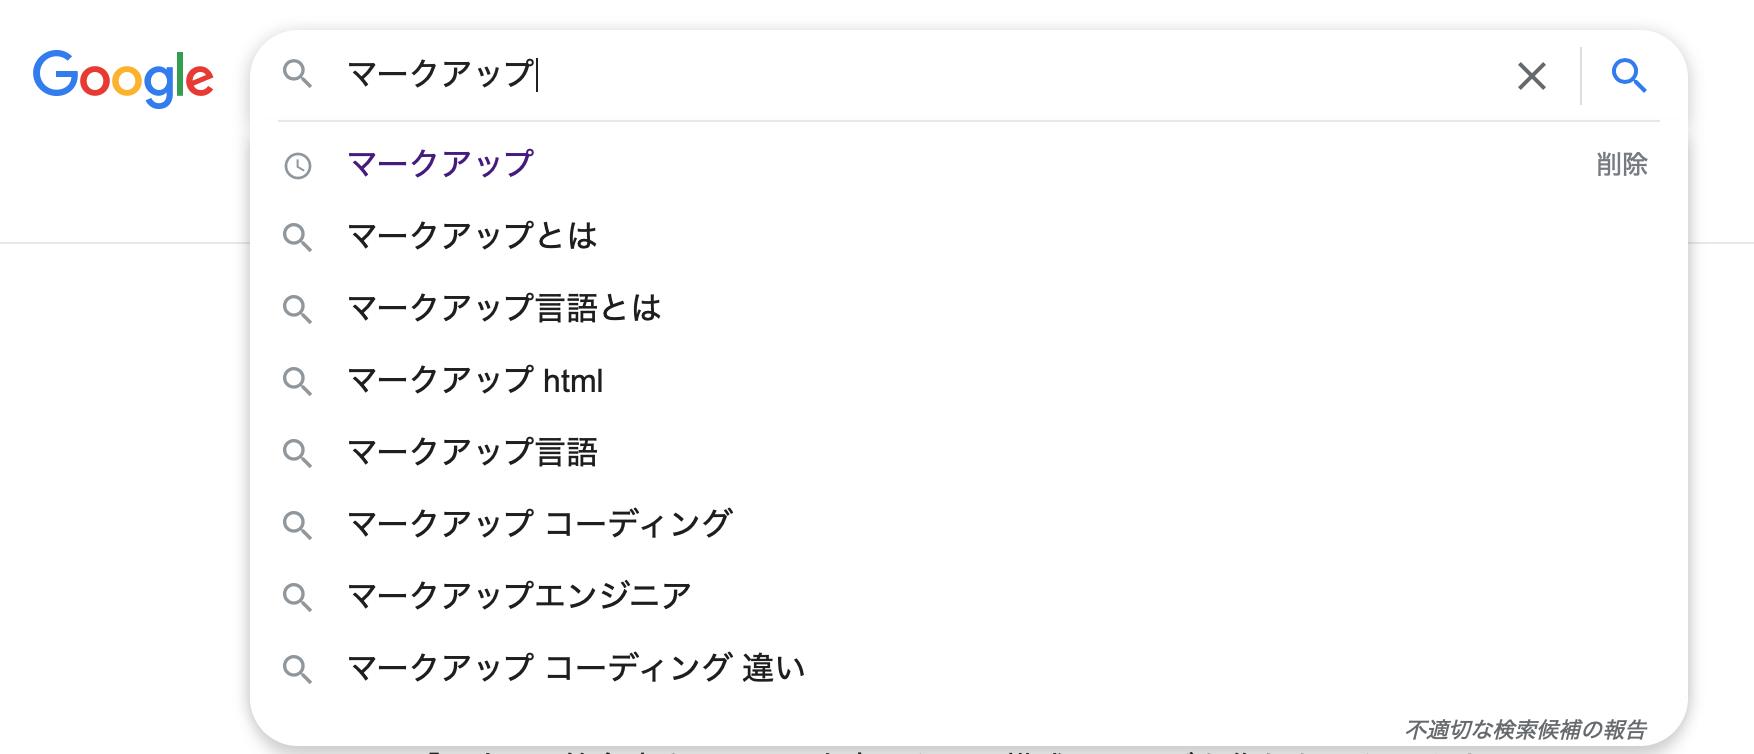 Google検索窓に表示されるサジェストワード